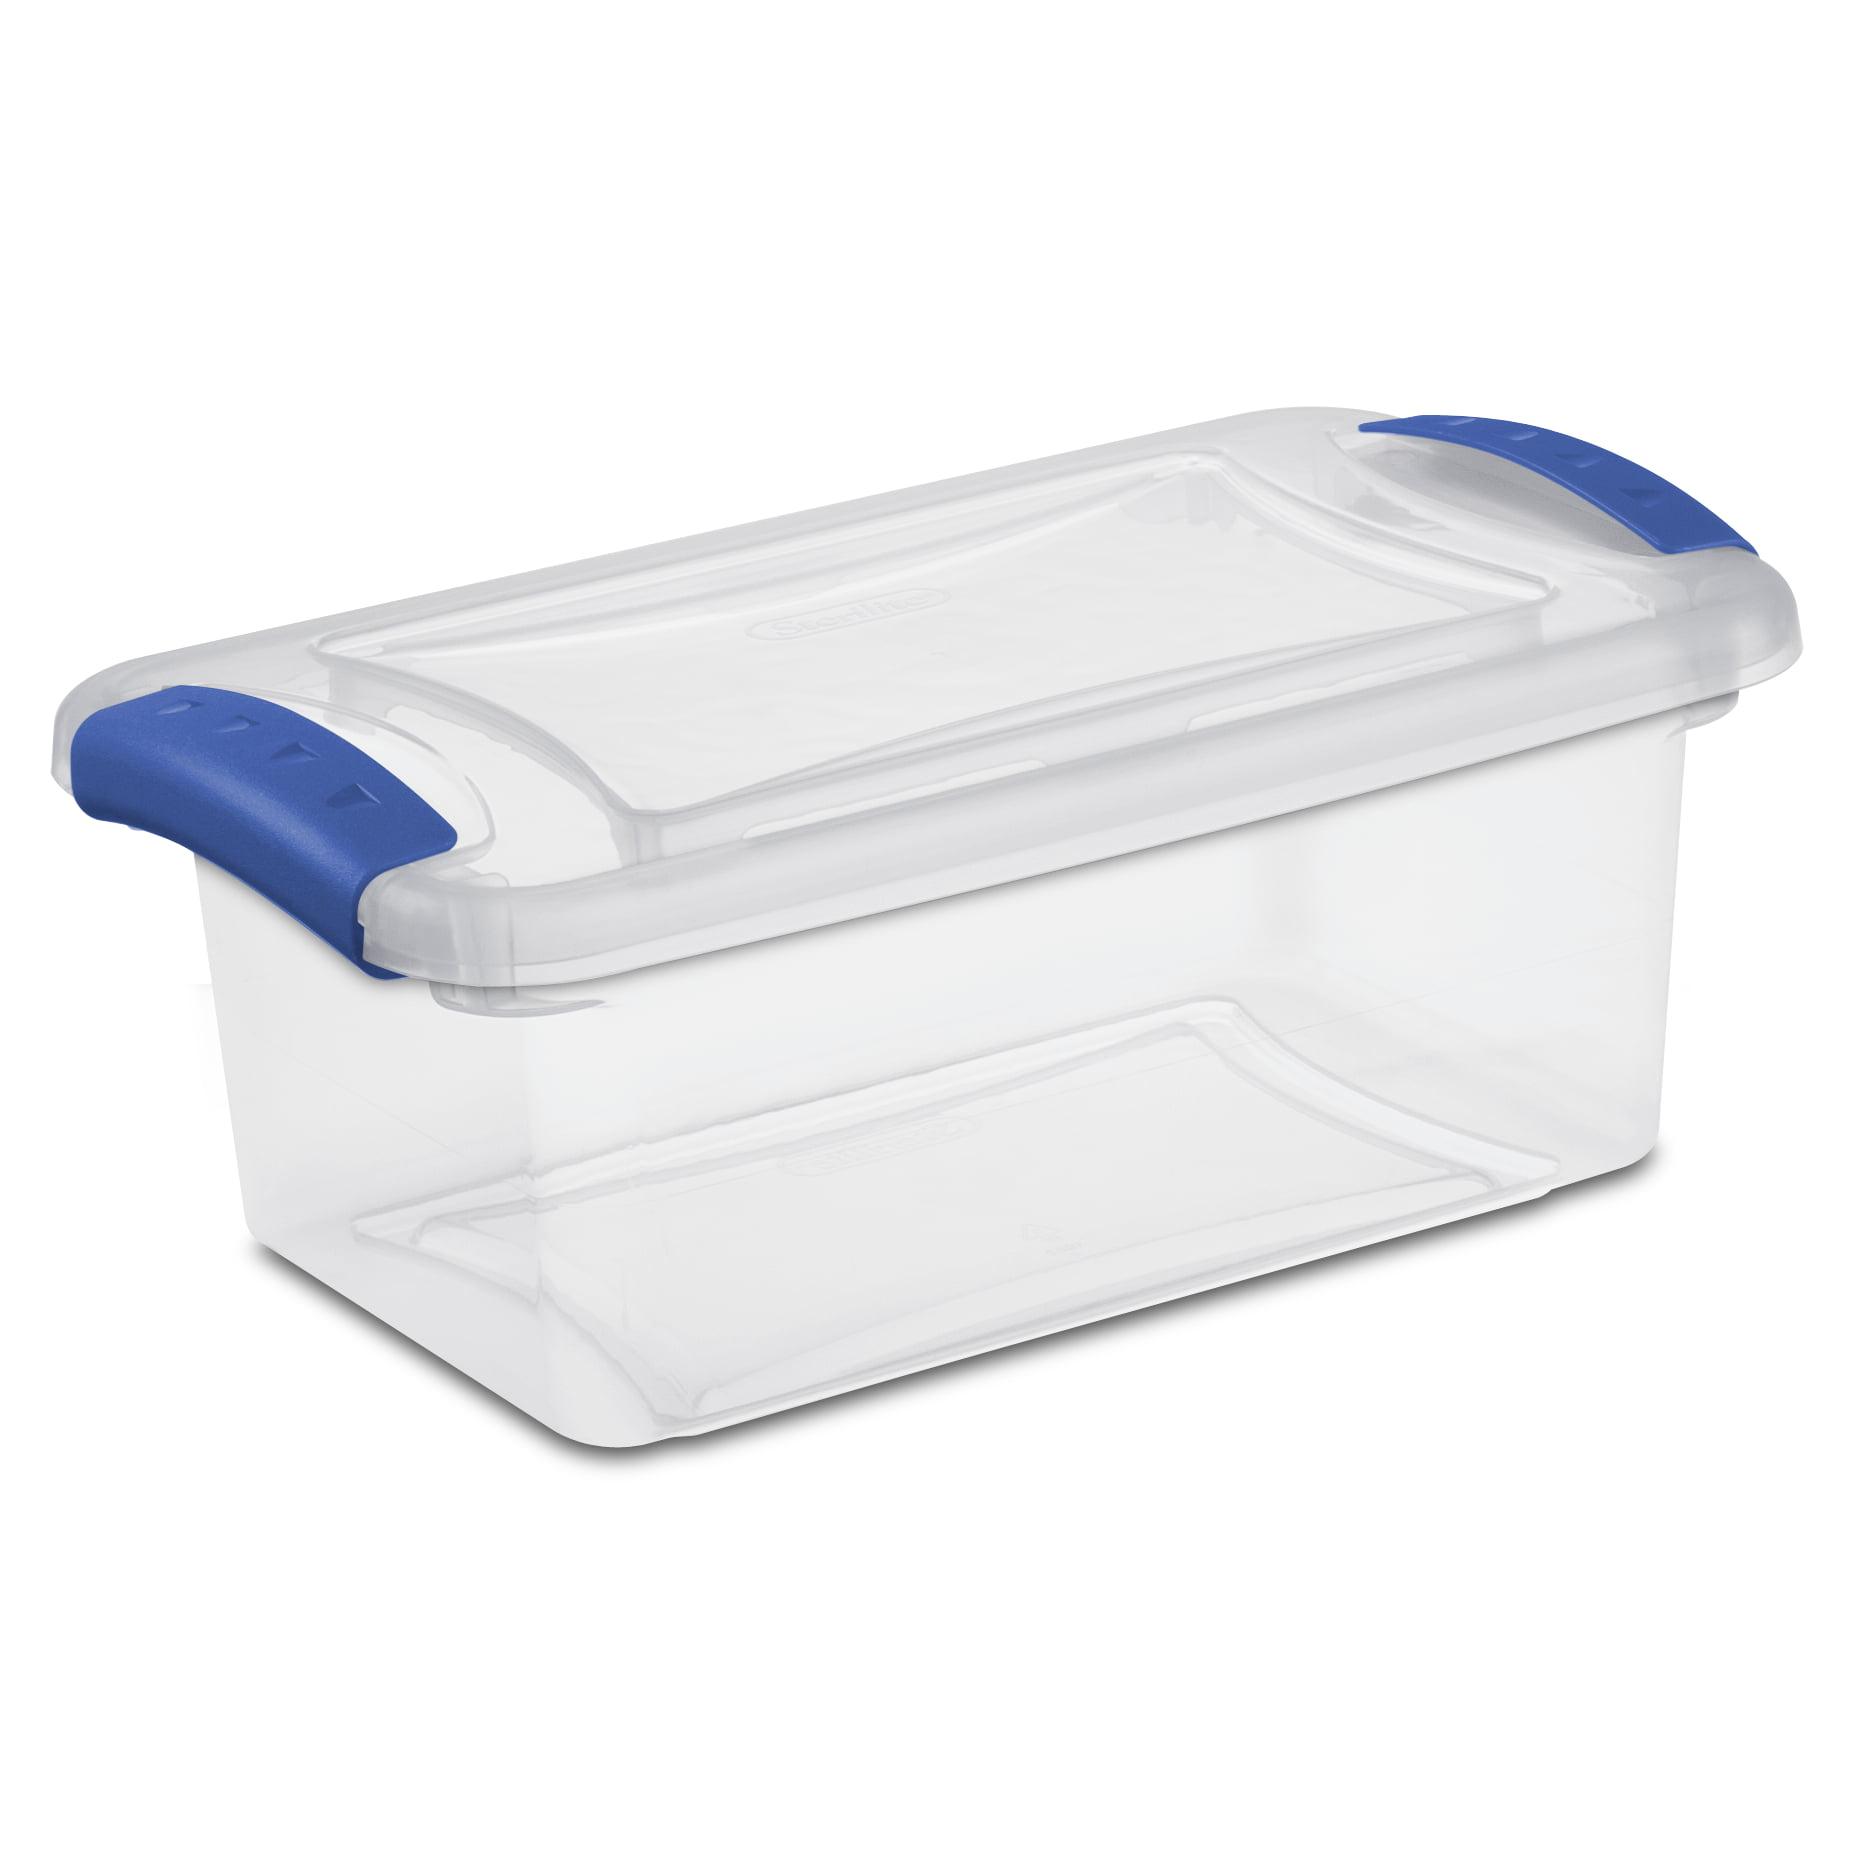 Sterilite 7 Qt./6.6 L Latch Box, Stadium Blue